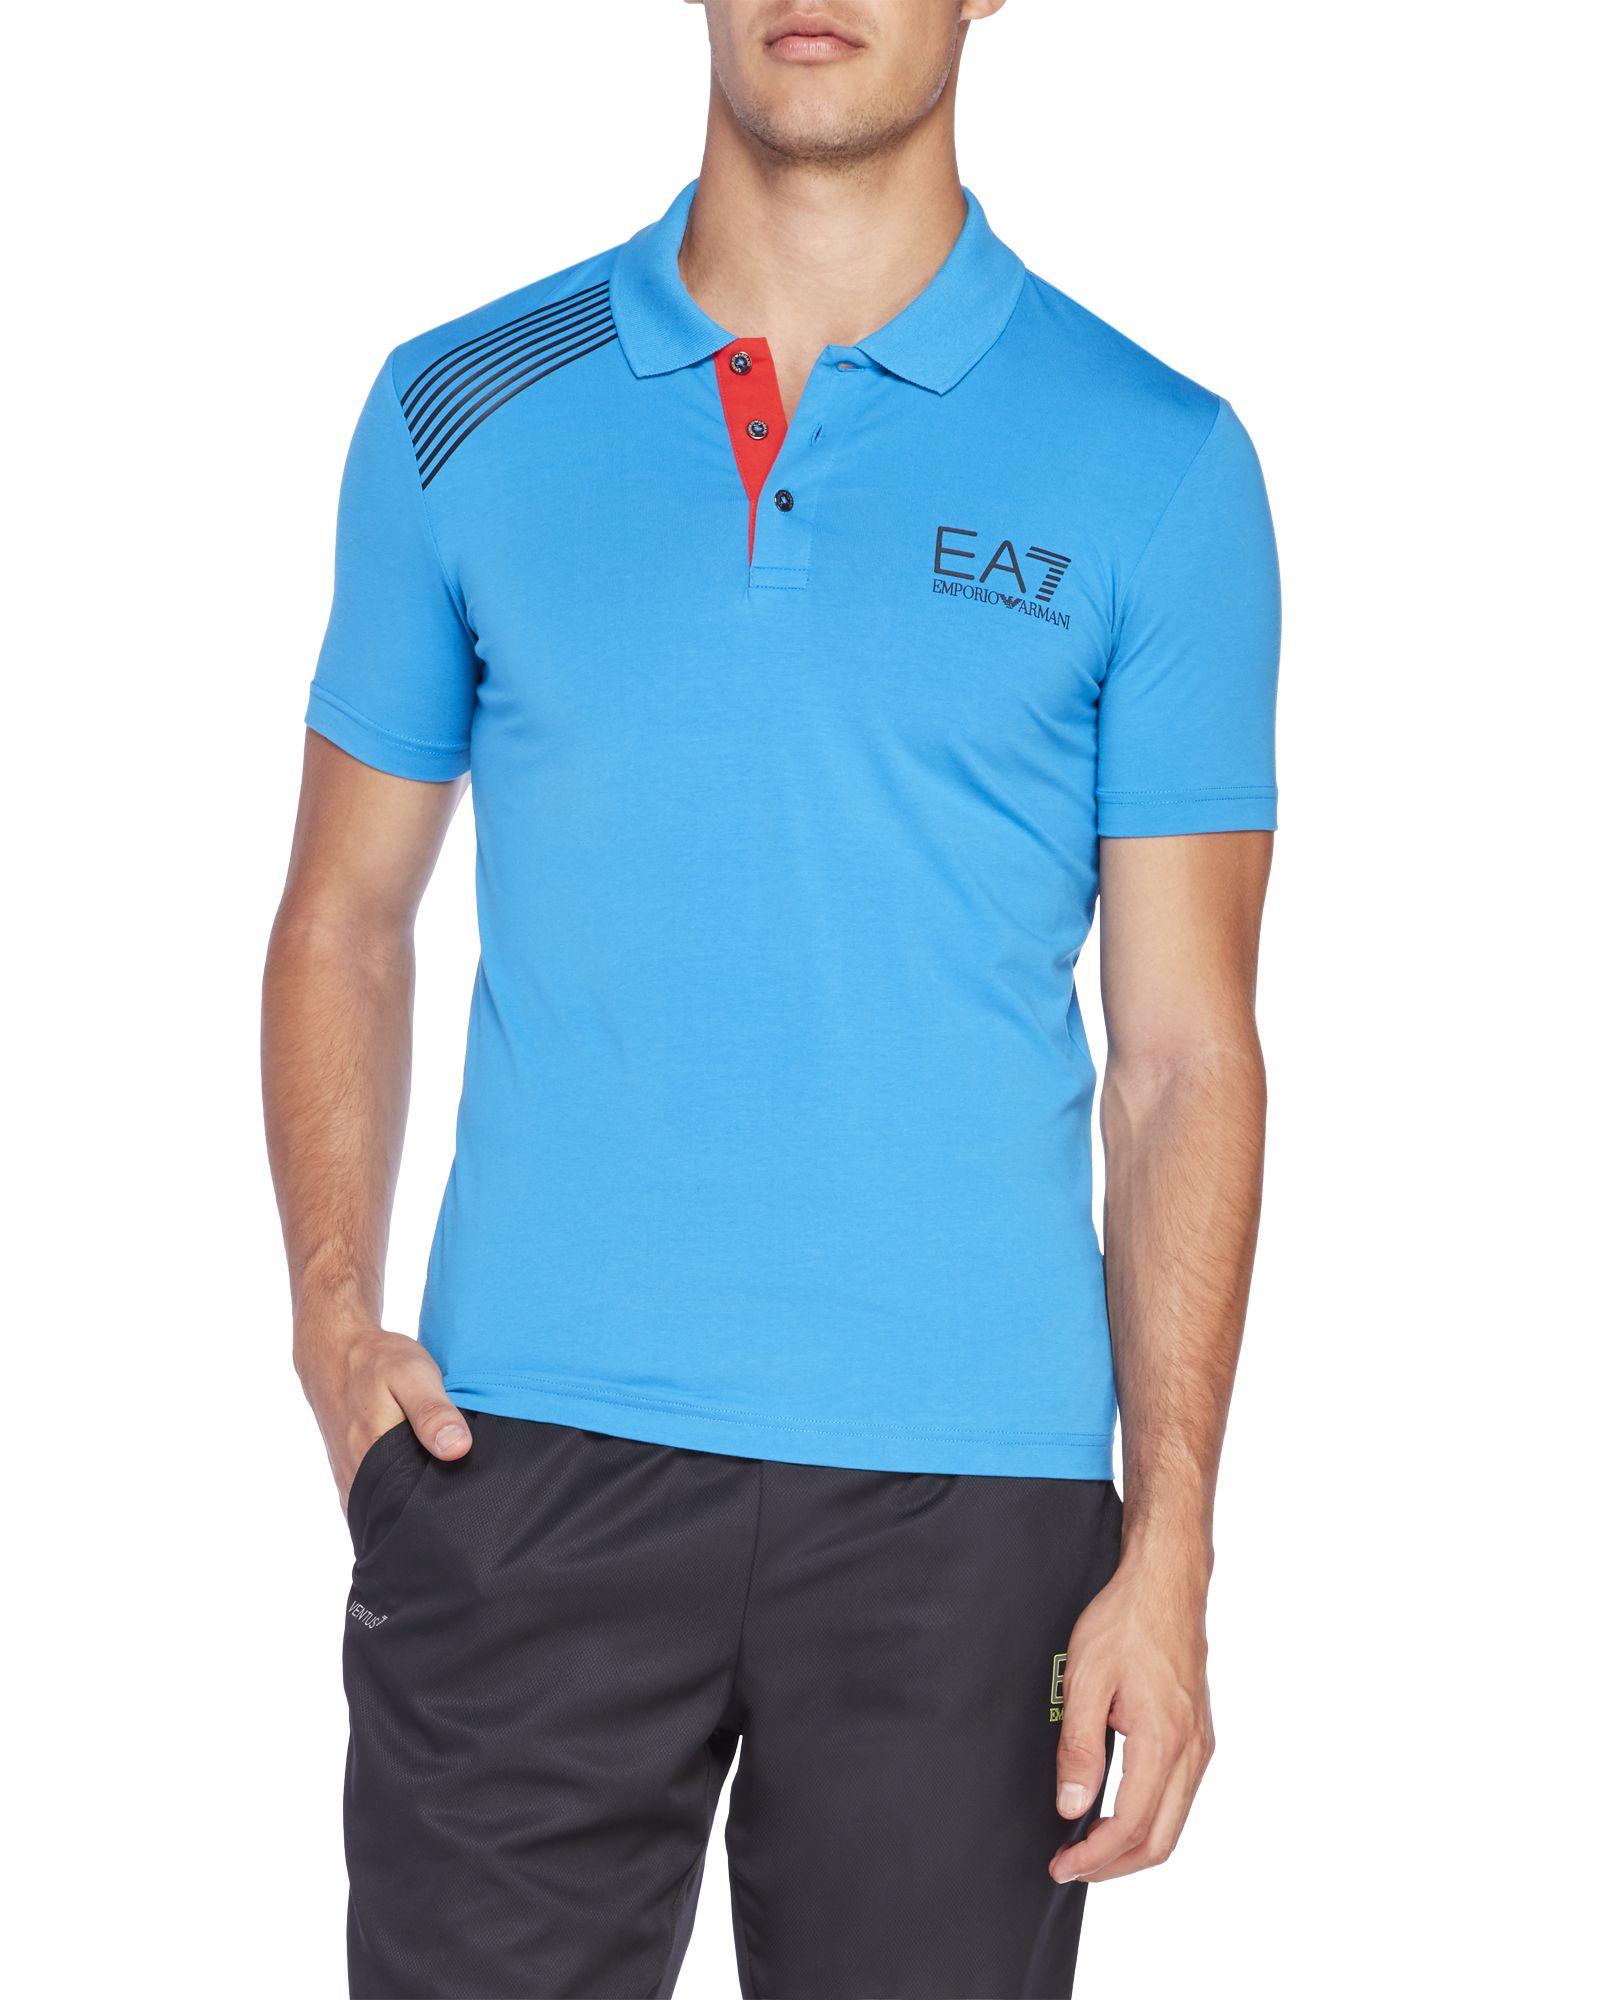 Ea7 Emporio Armani Stripe Polo Shirt Century 21 Stores Polo